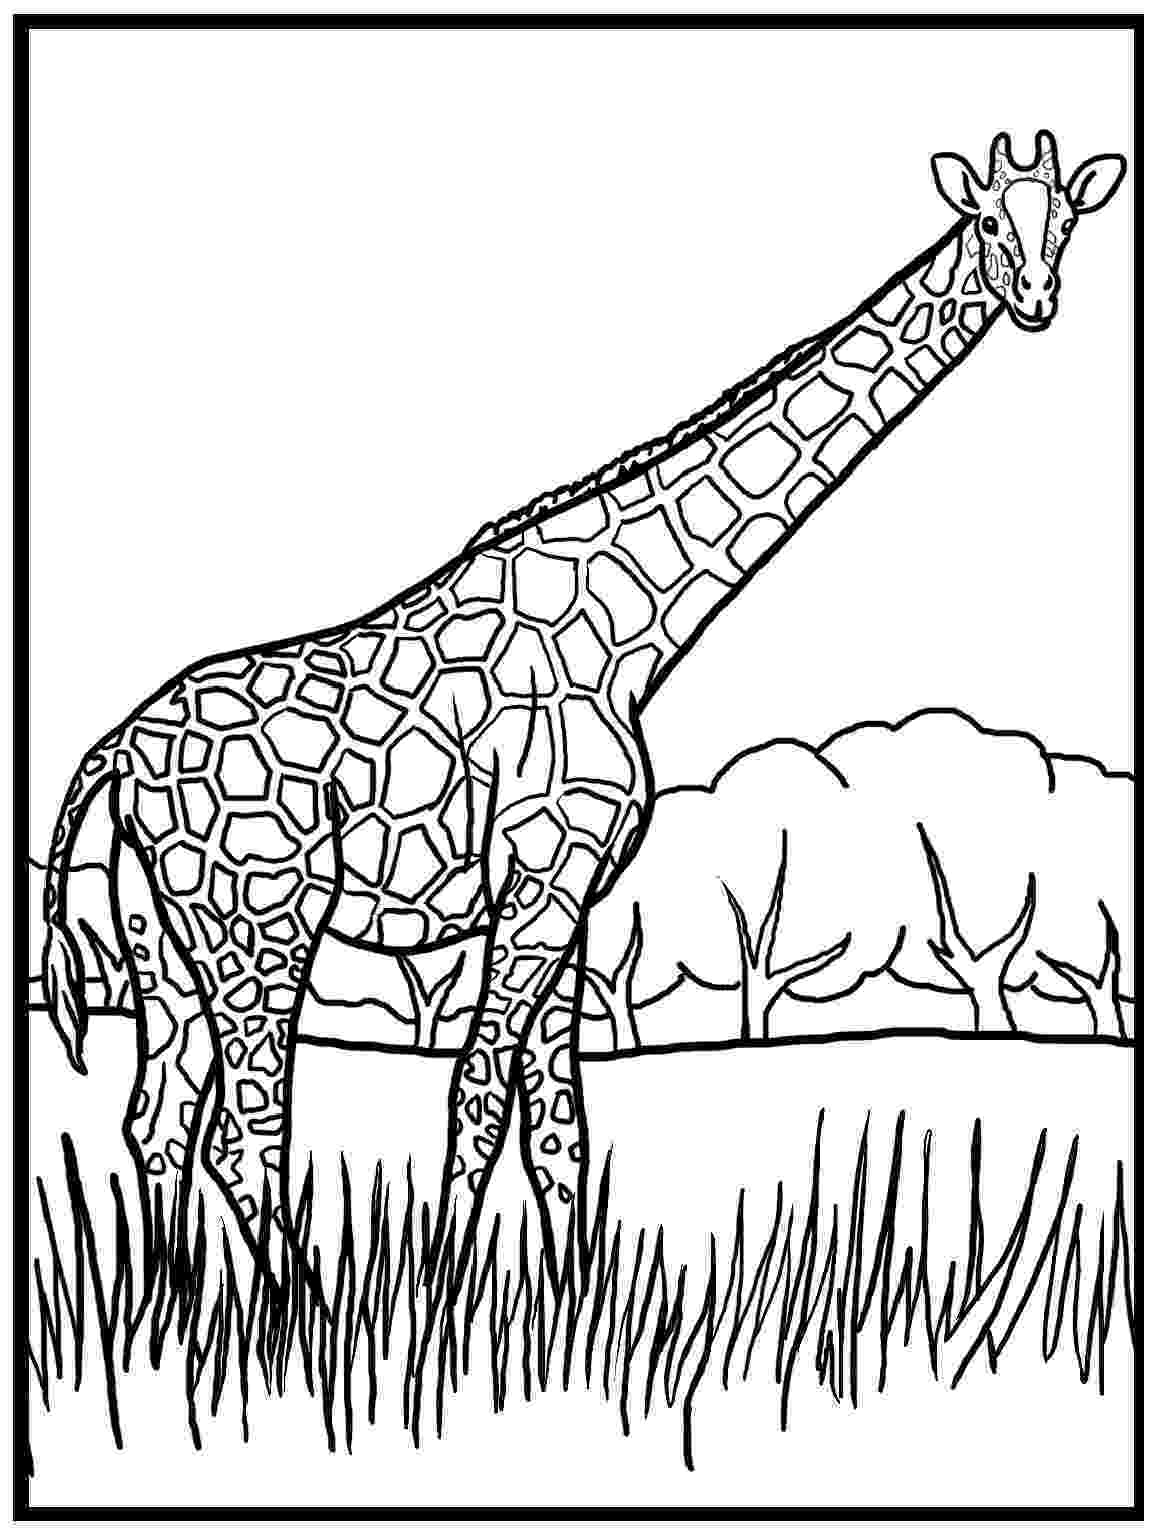 giraffe to color nice tall giraffe coloring page wecoloringpage giraffe to color giraffe